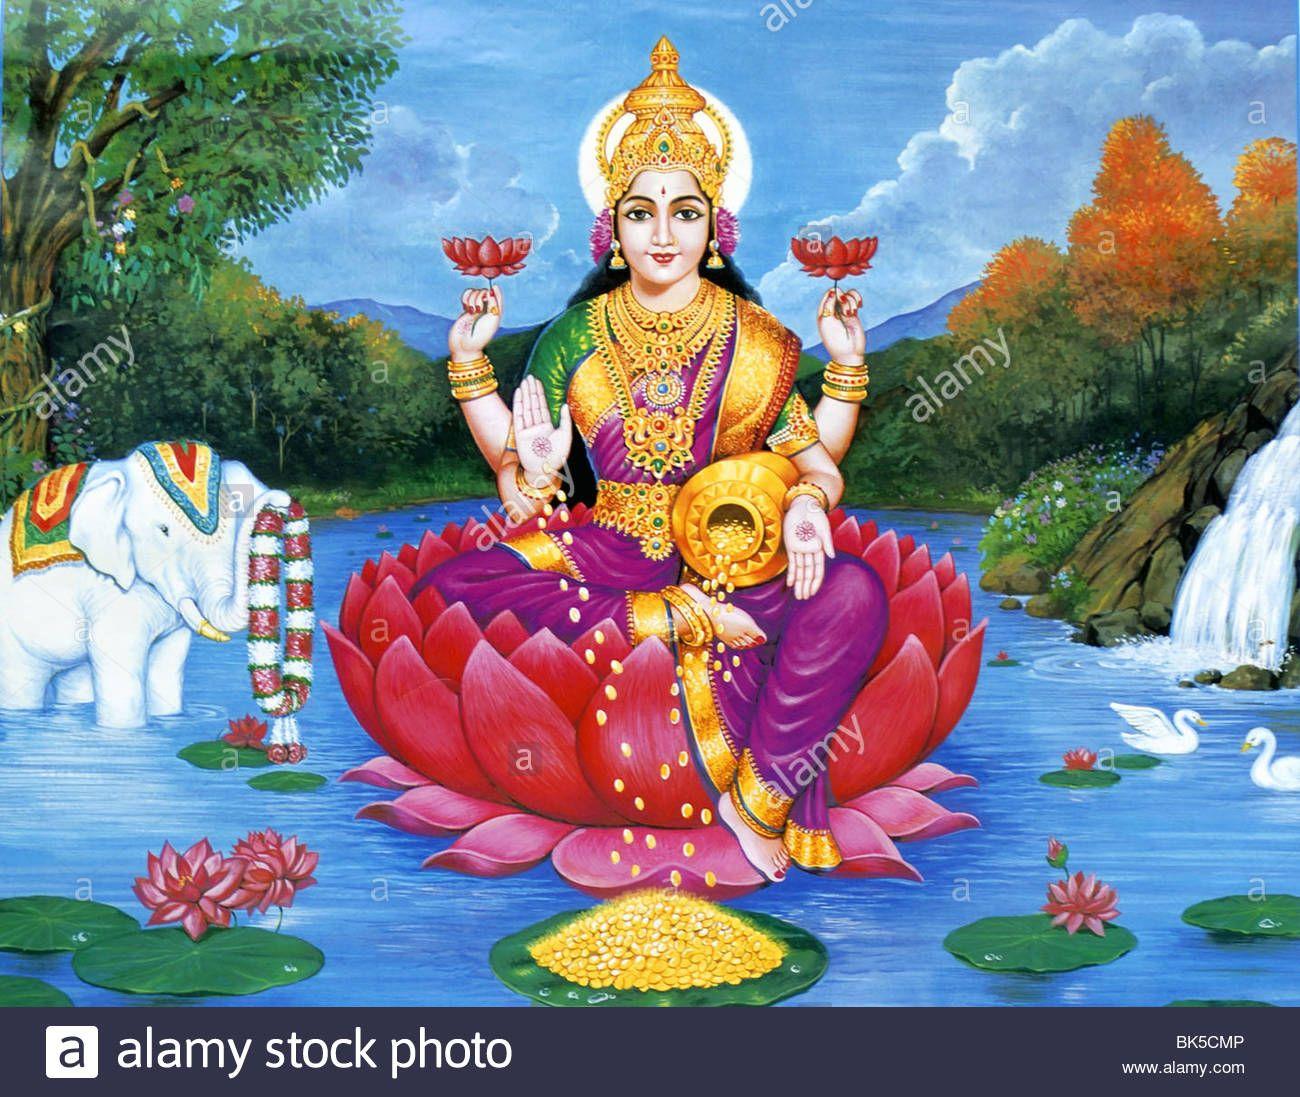 42+ Hindu goddess of fortune ideas in 2021